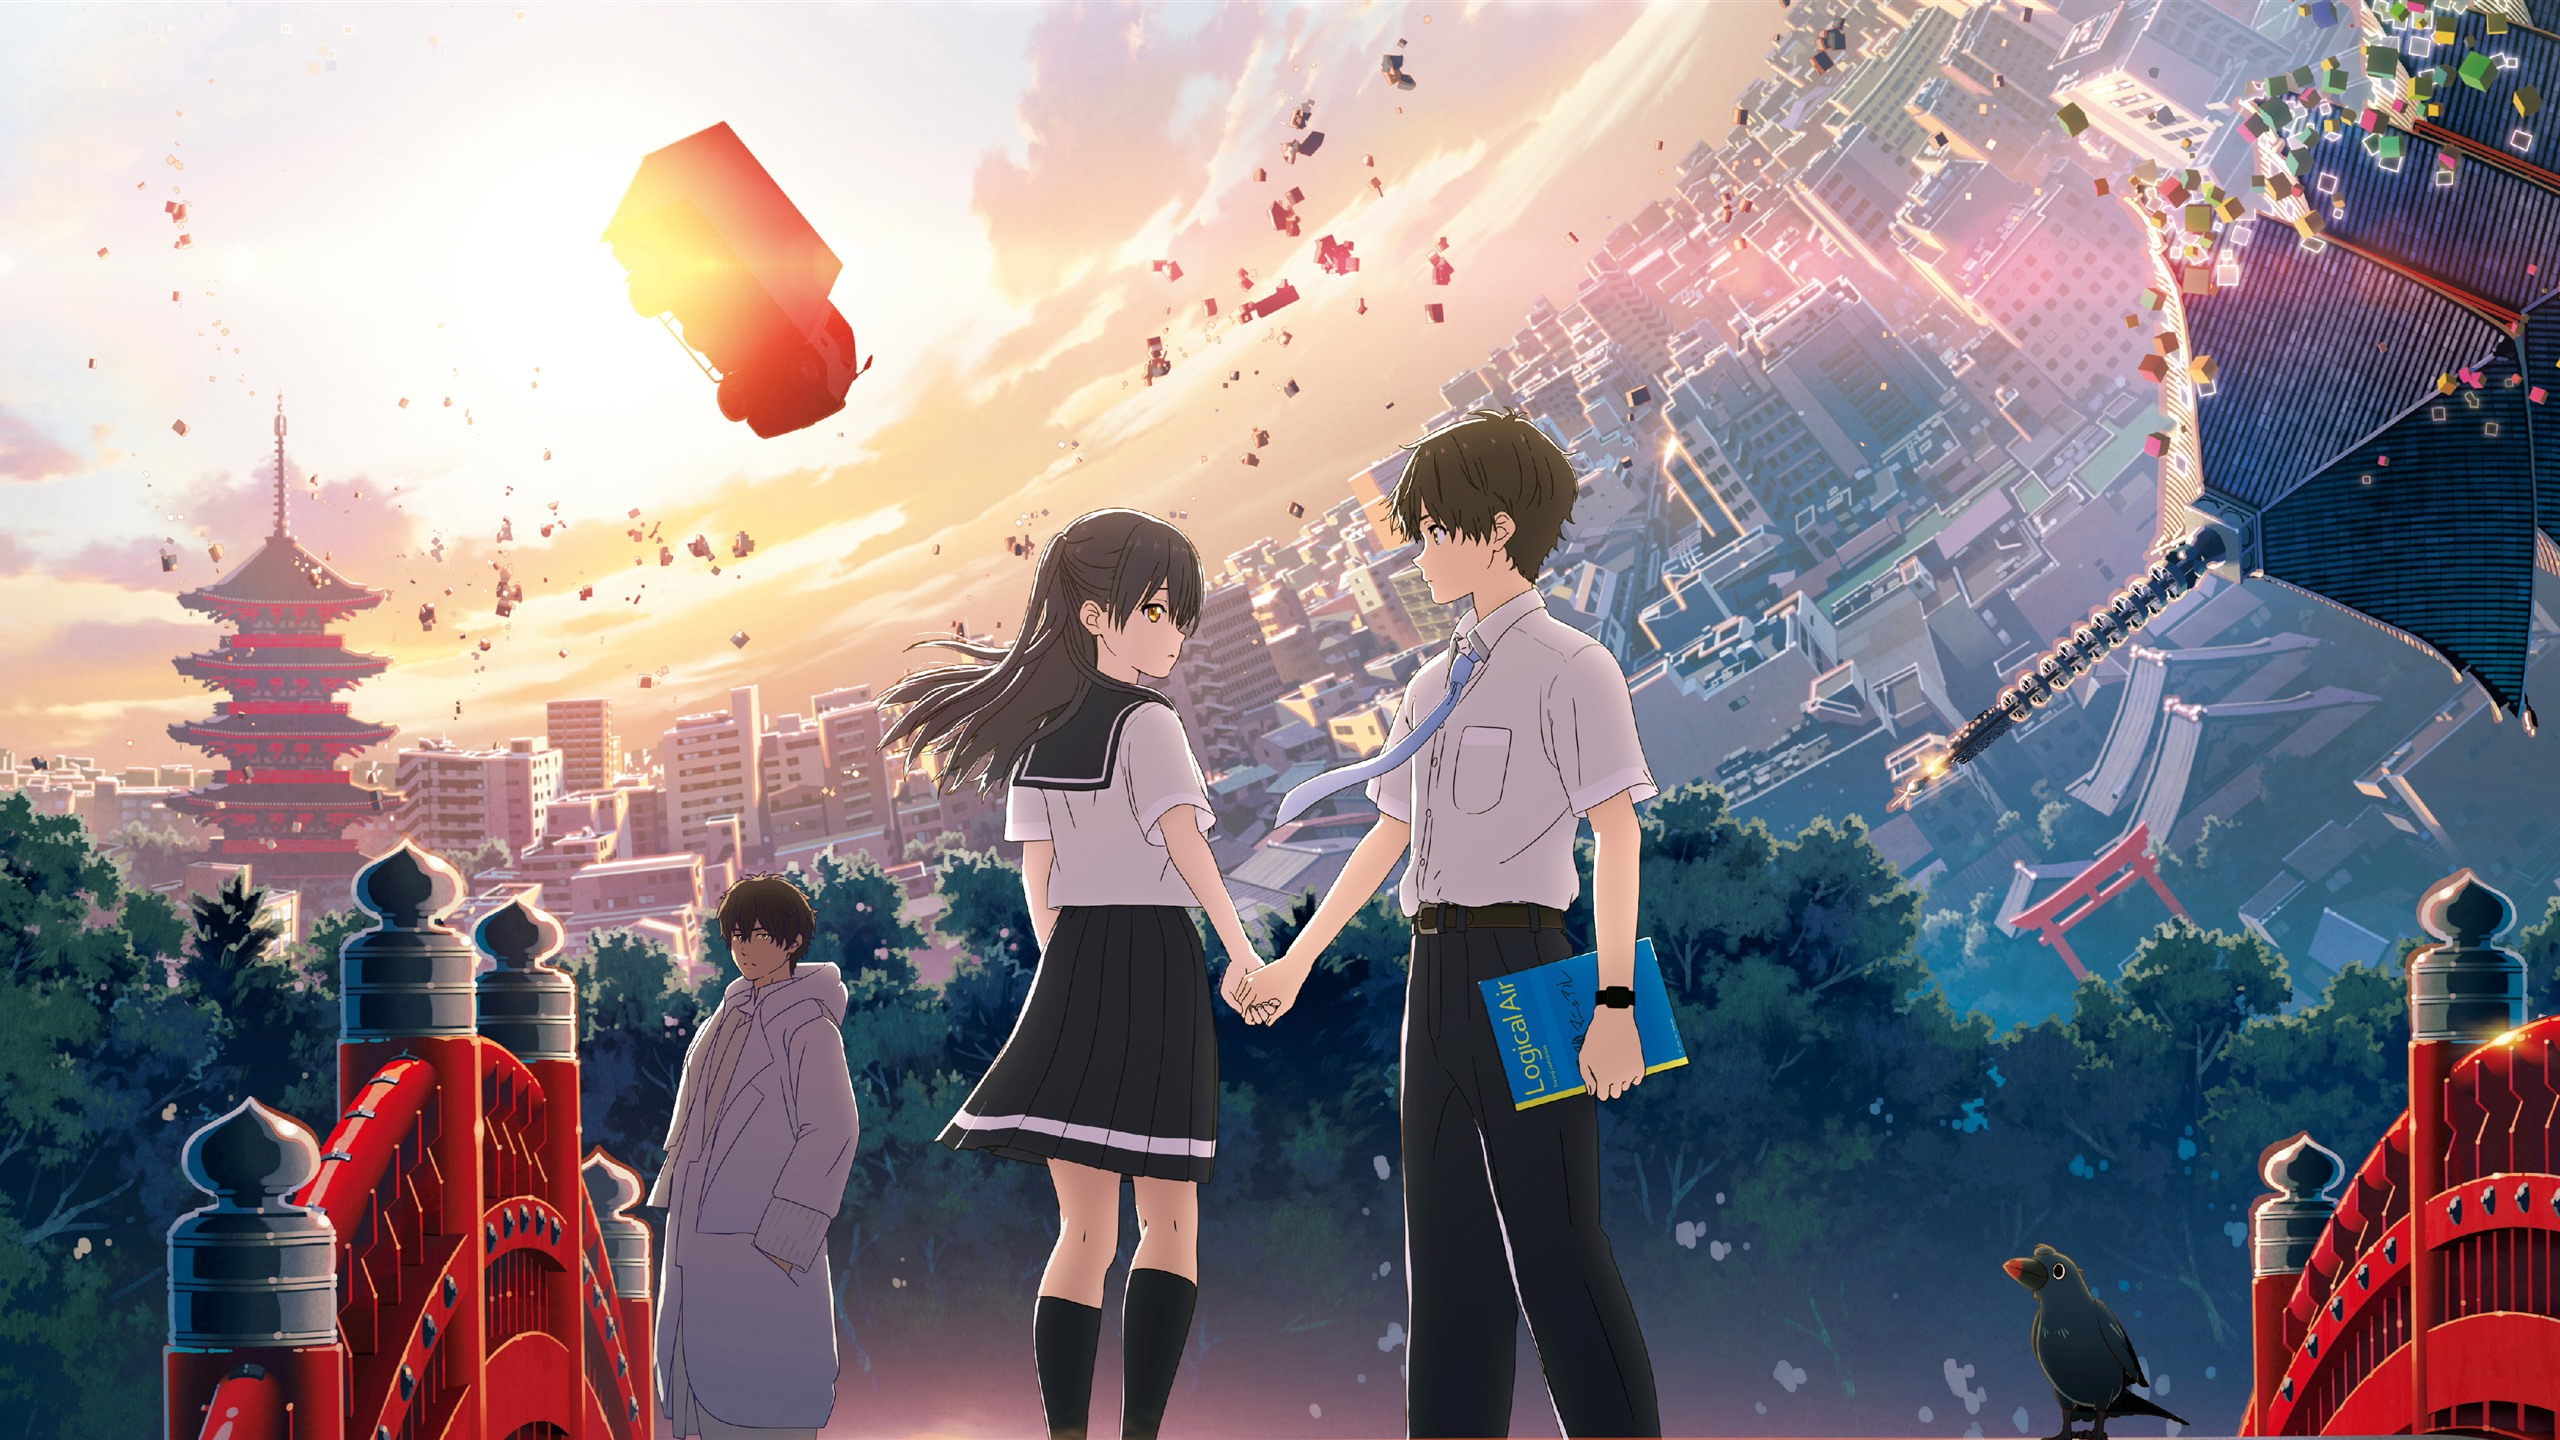 Wallpaper HELLO WORLD Anime Movie 2019 3840x2160 UHD 4K